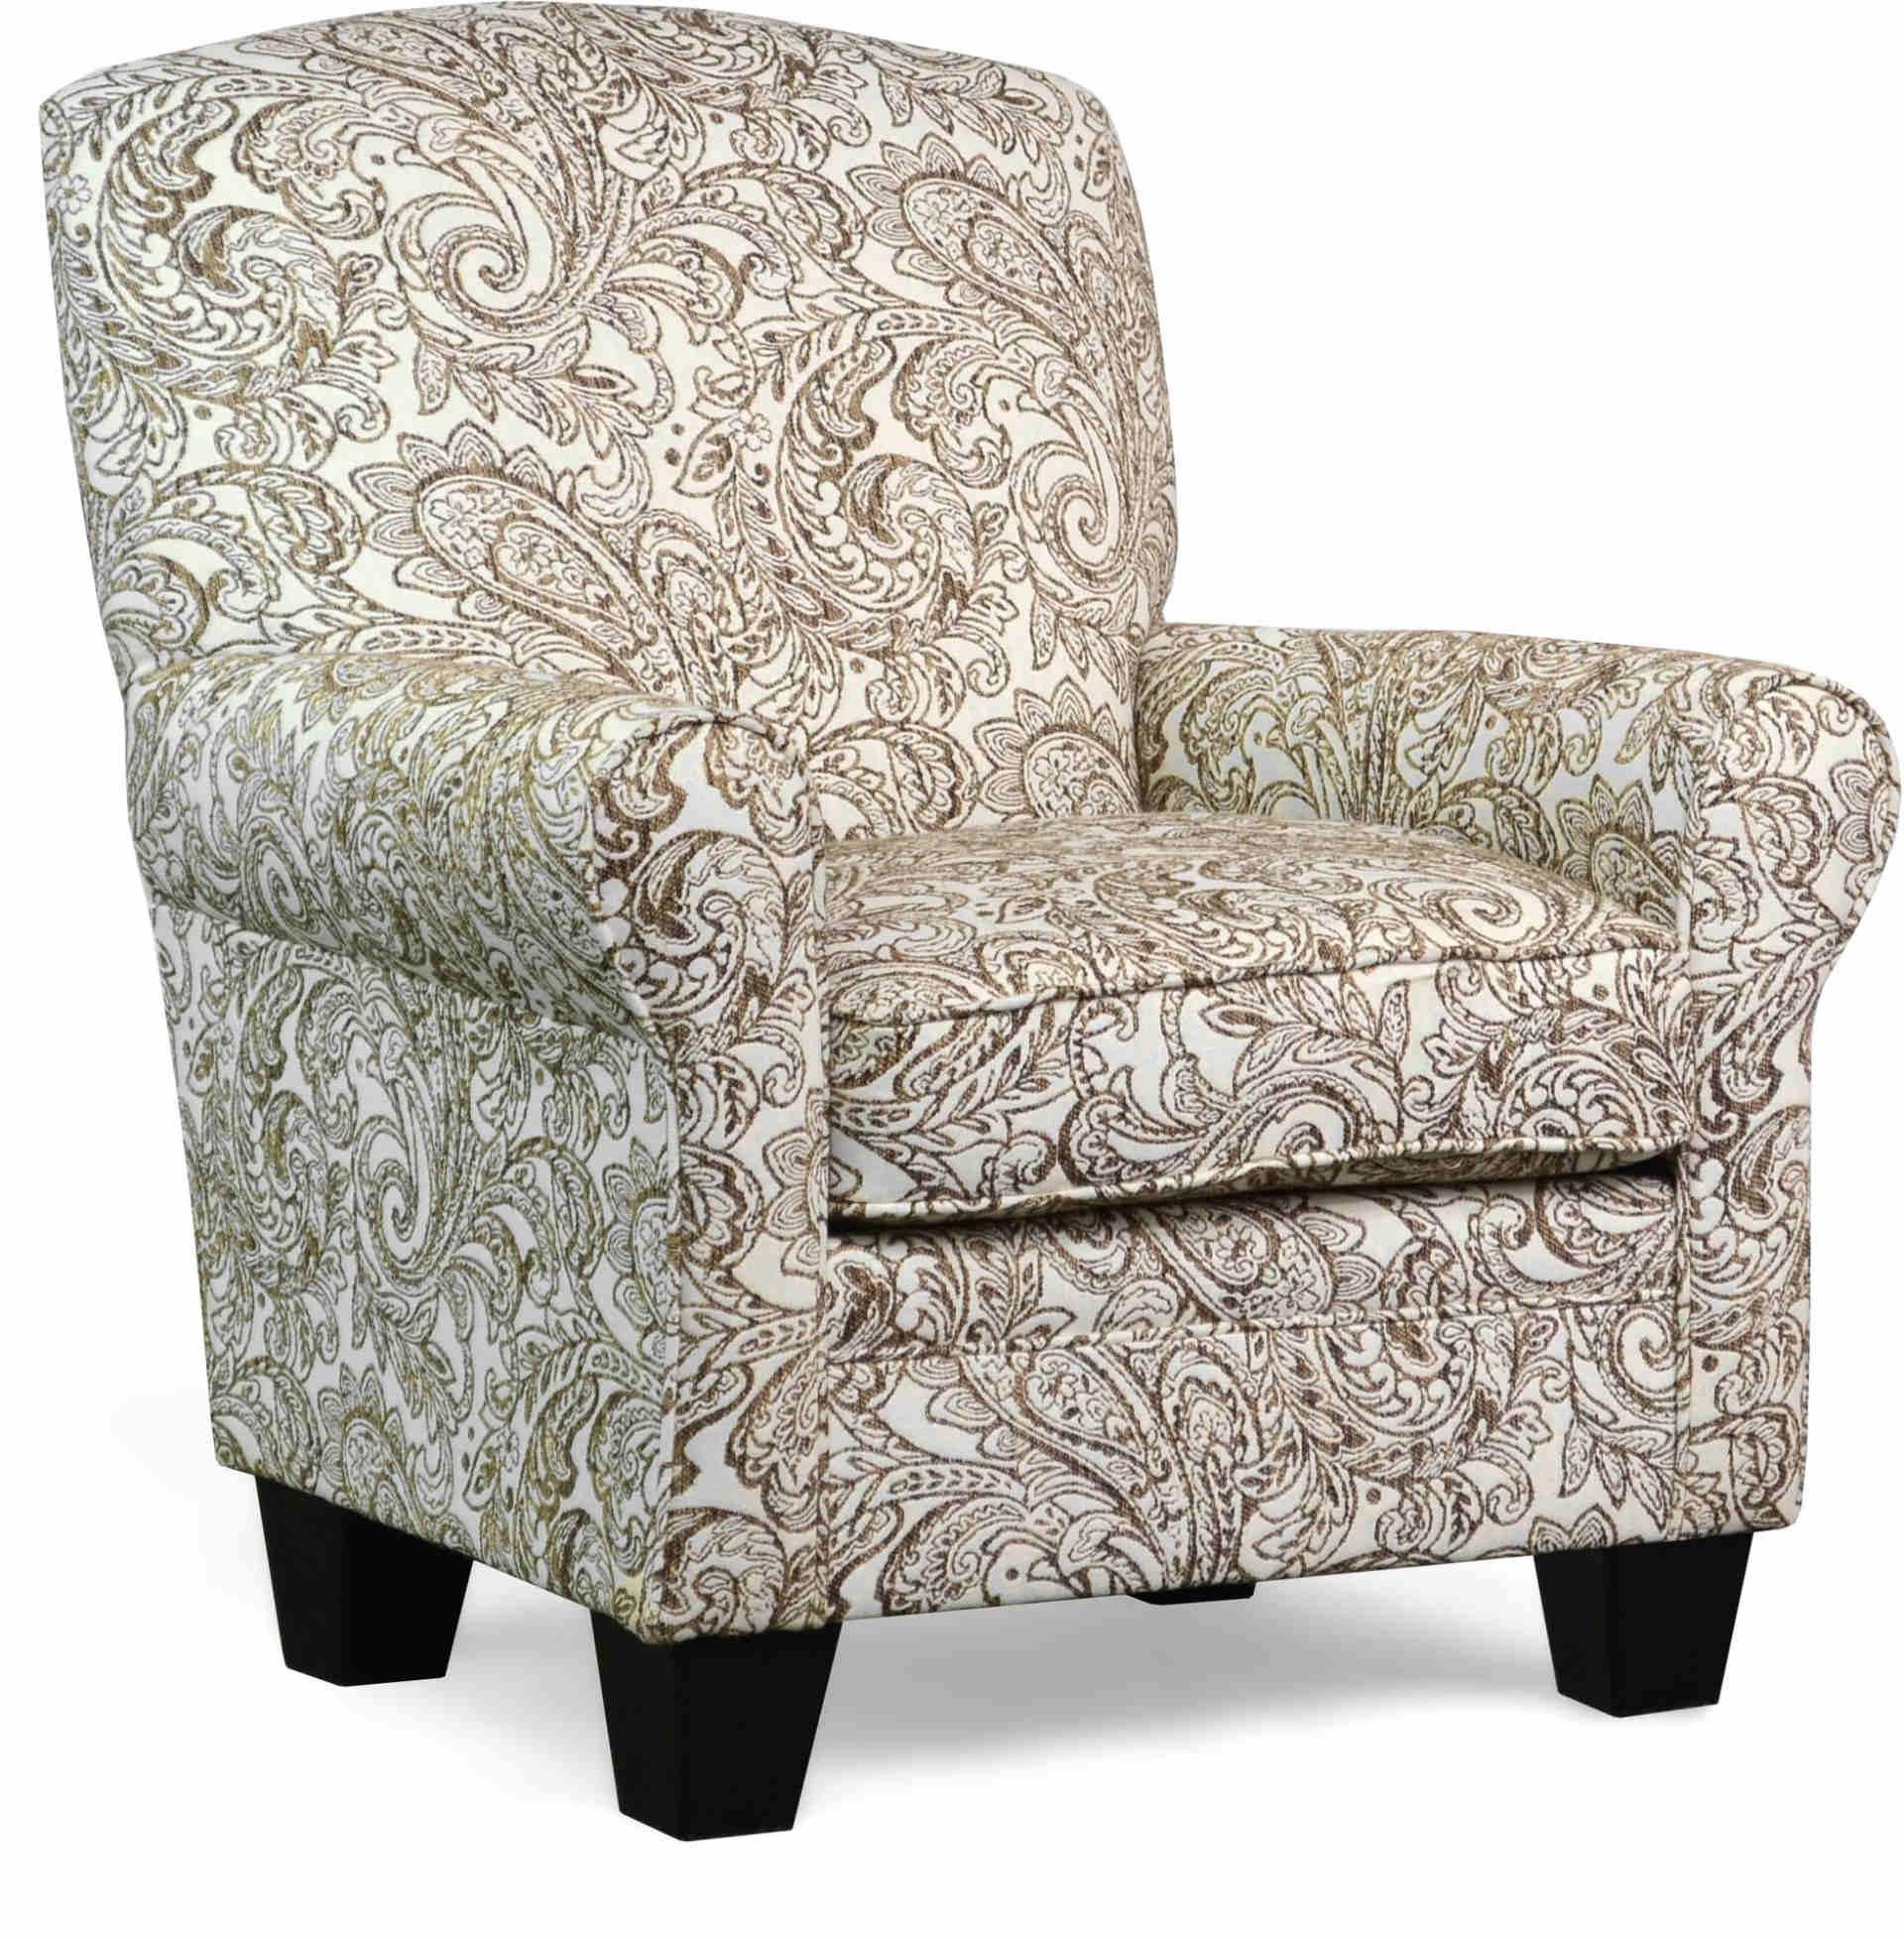 Discontinued Furniture Clearance: Furniture Clearance Center